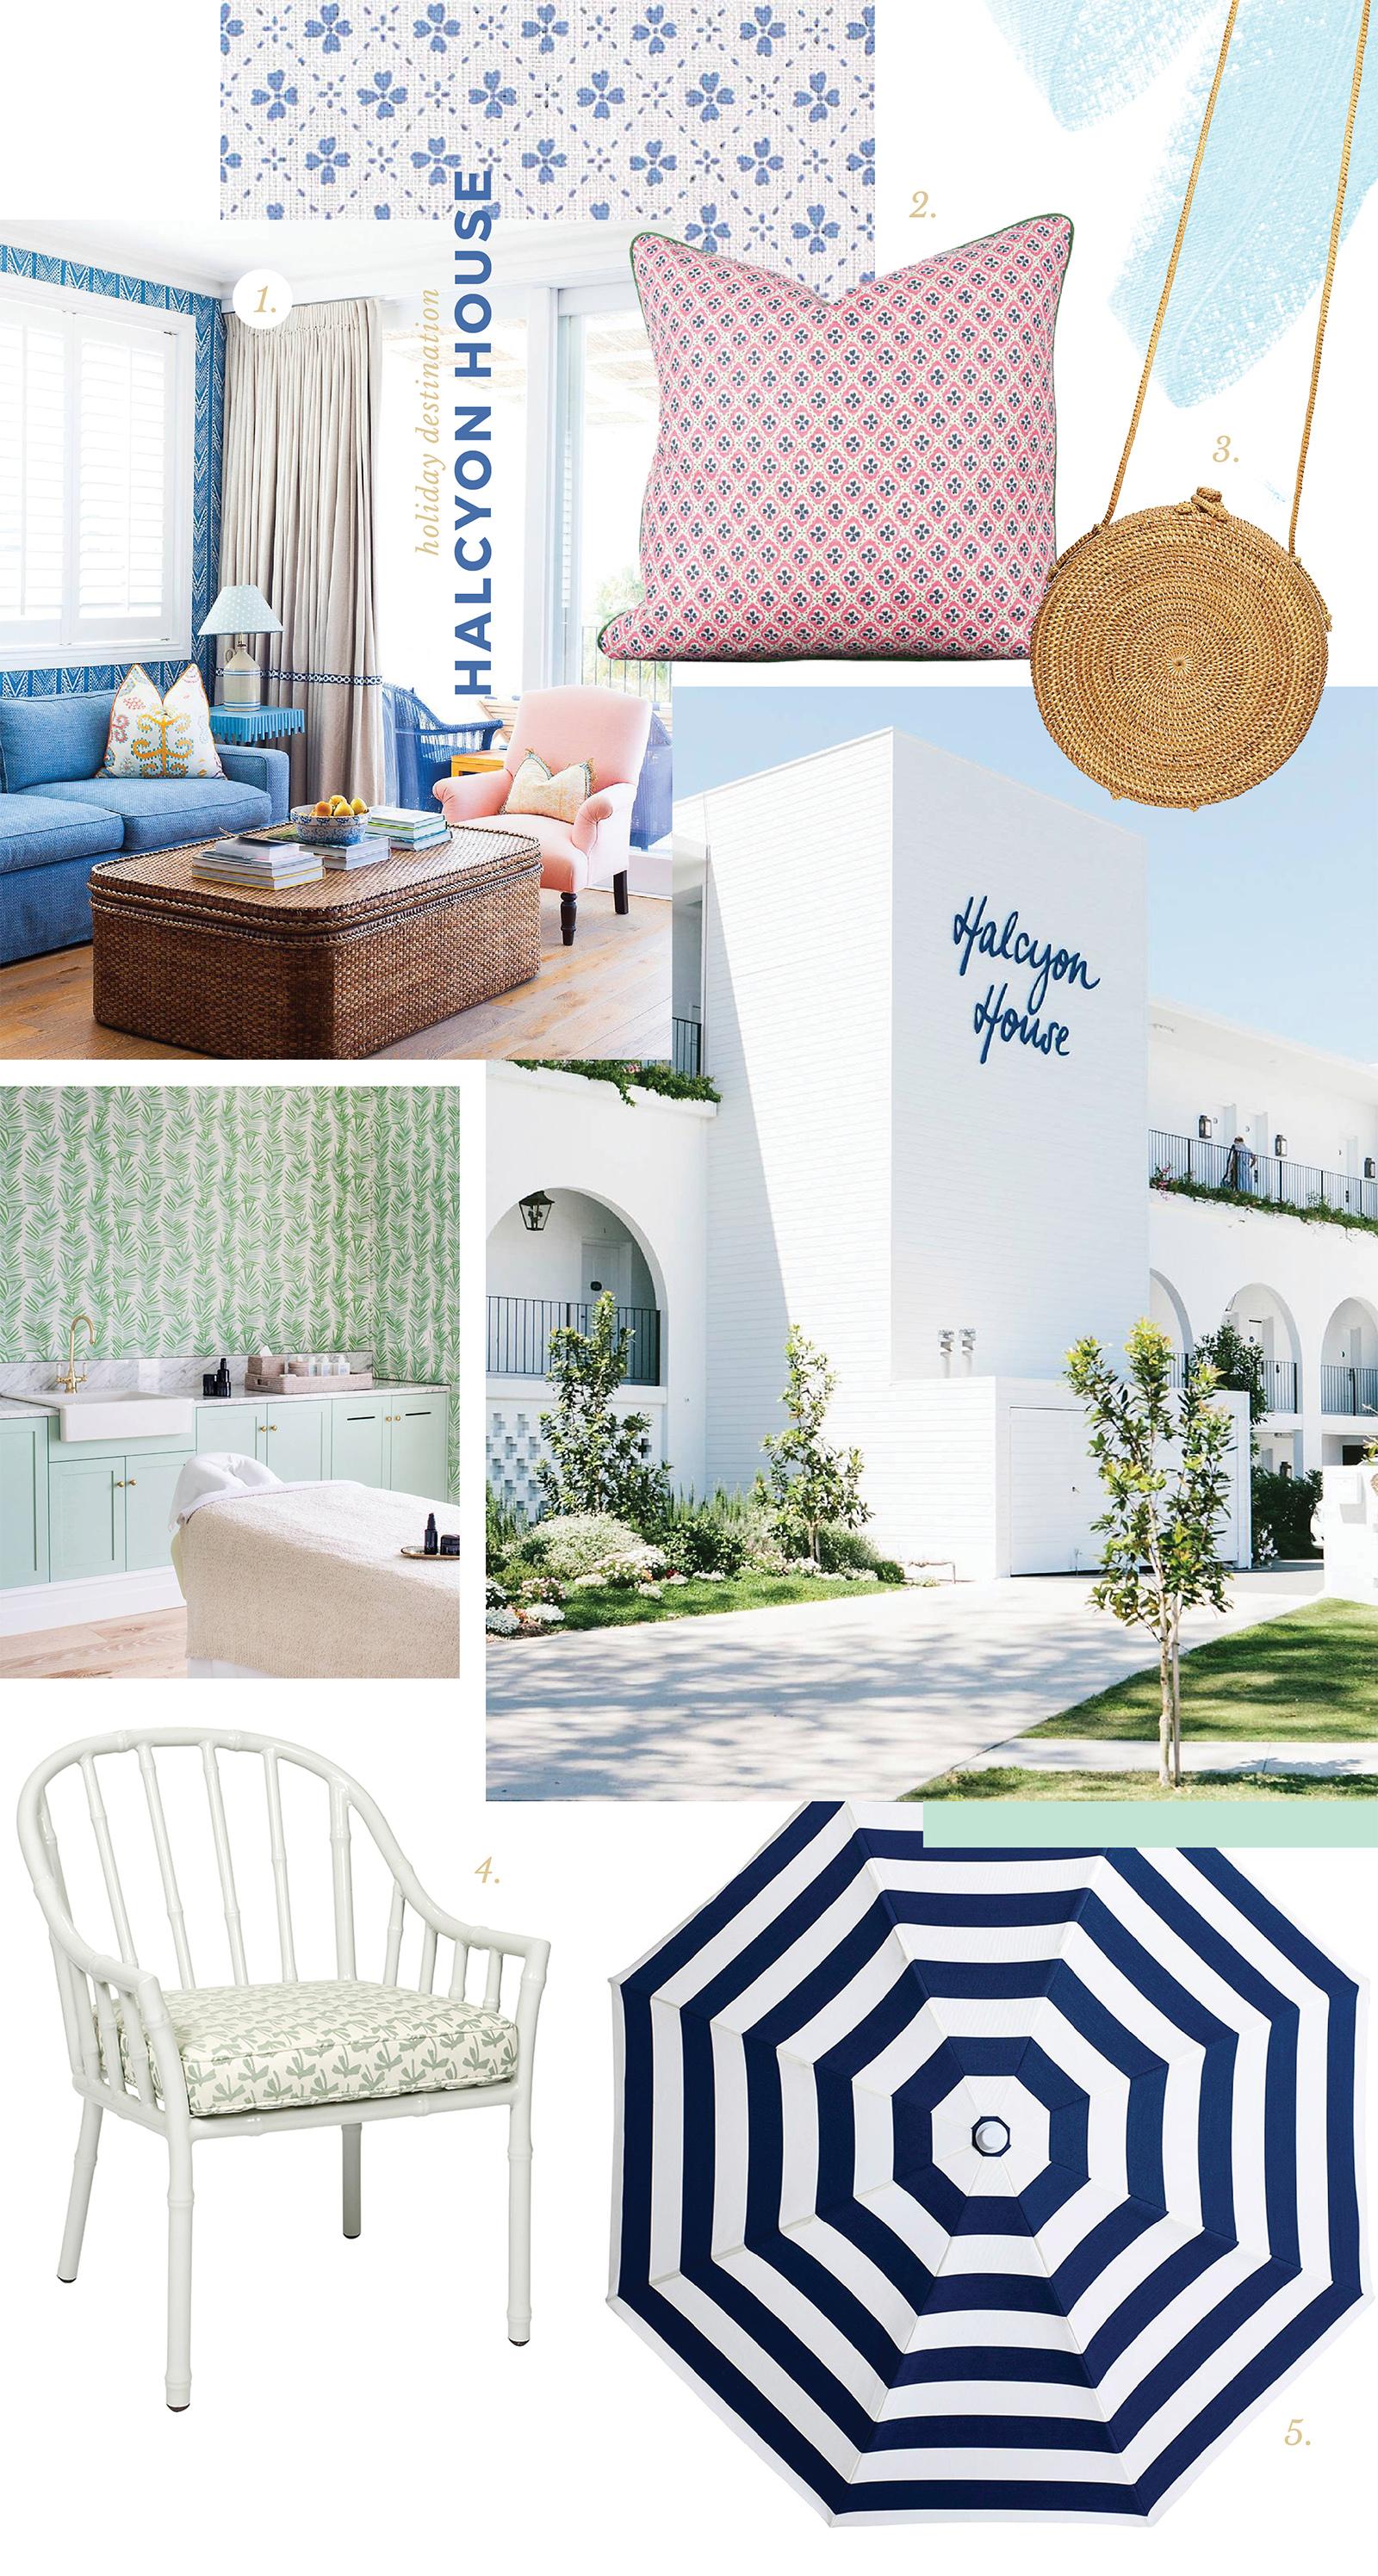 halcyon_house_carbarita_beach_Australian_coastal_style_anna_spiro_colour_classic.jpg